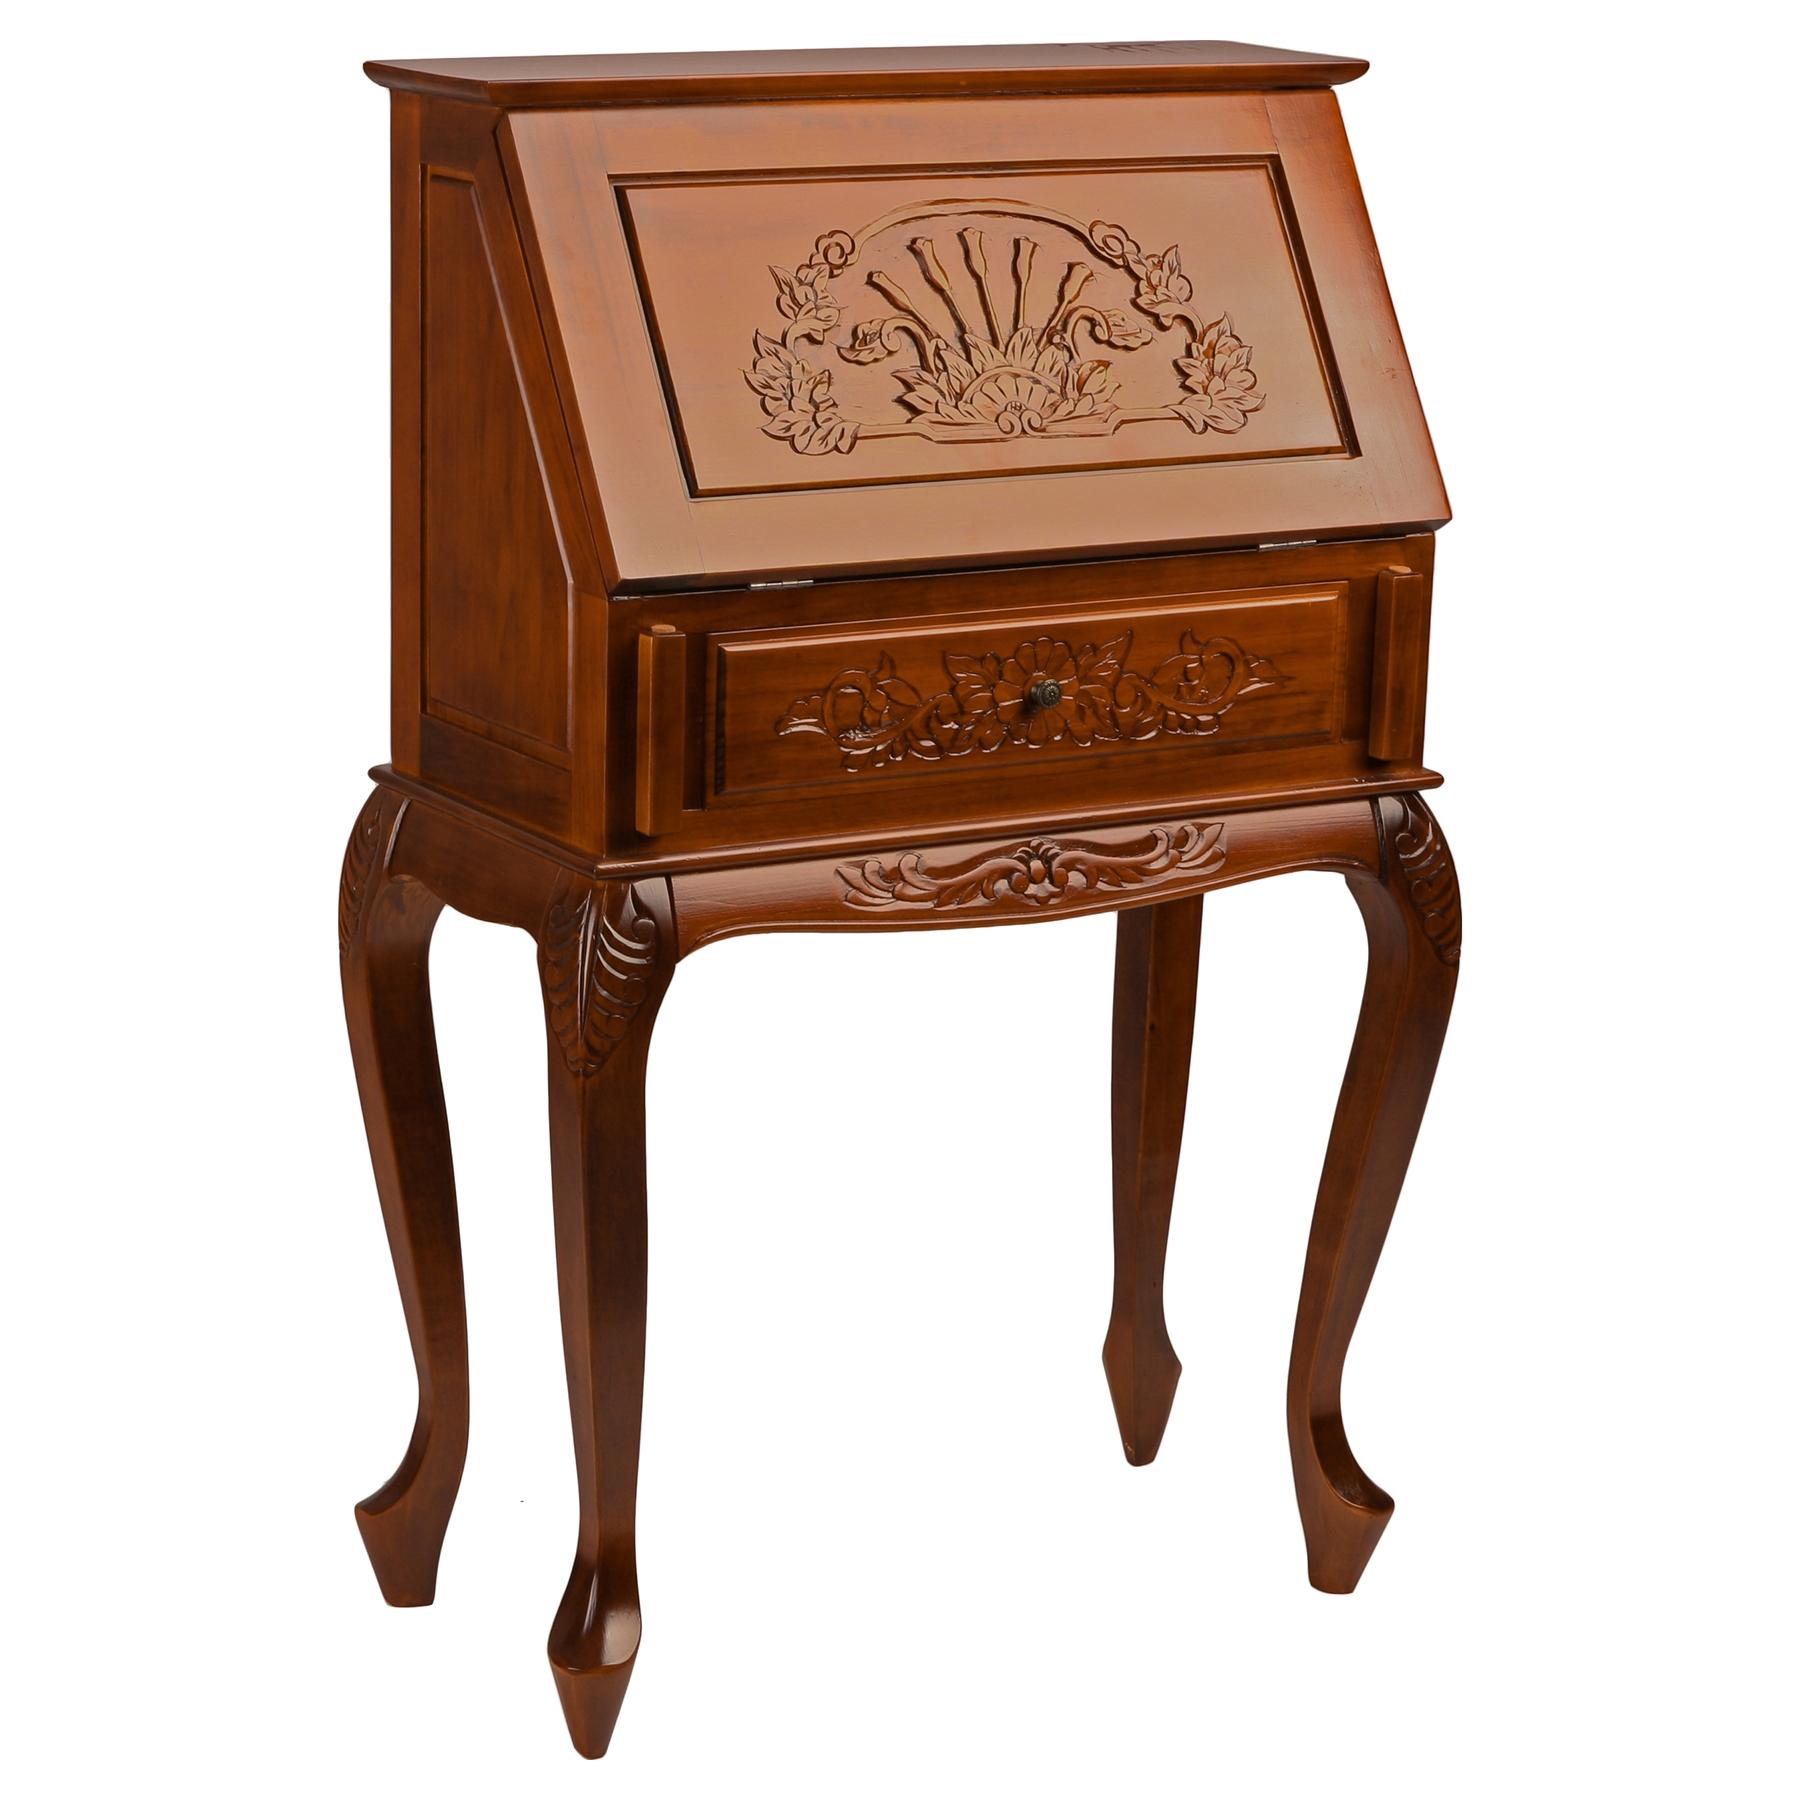 Victorian Wood Secretary Desk Mahogany Stain Finish  : 3832 from www.dcgstores.com size 1000 x 1000 jpeg 305kB